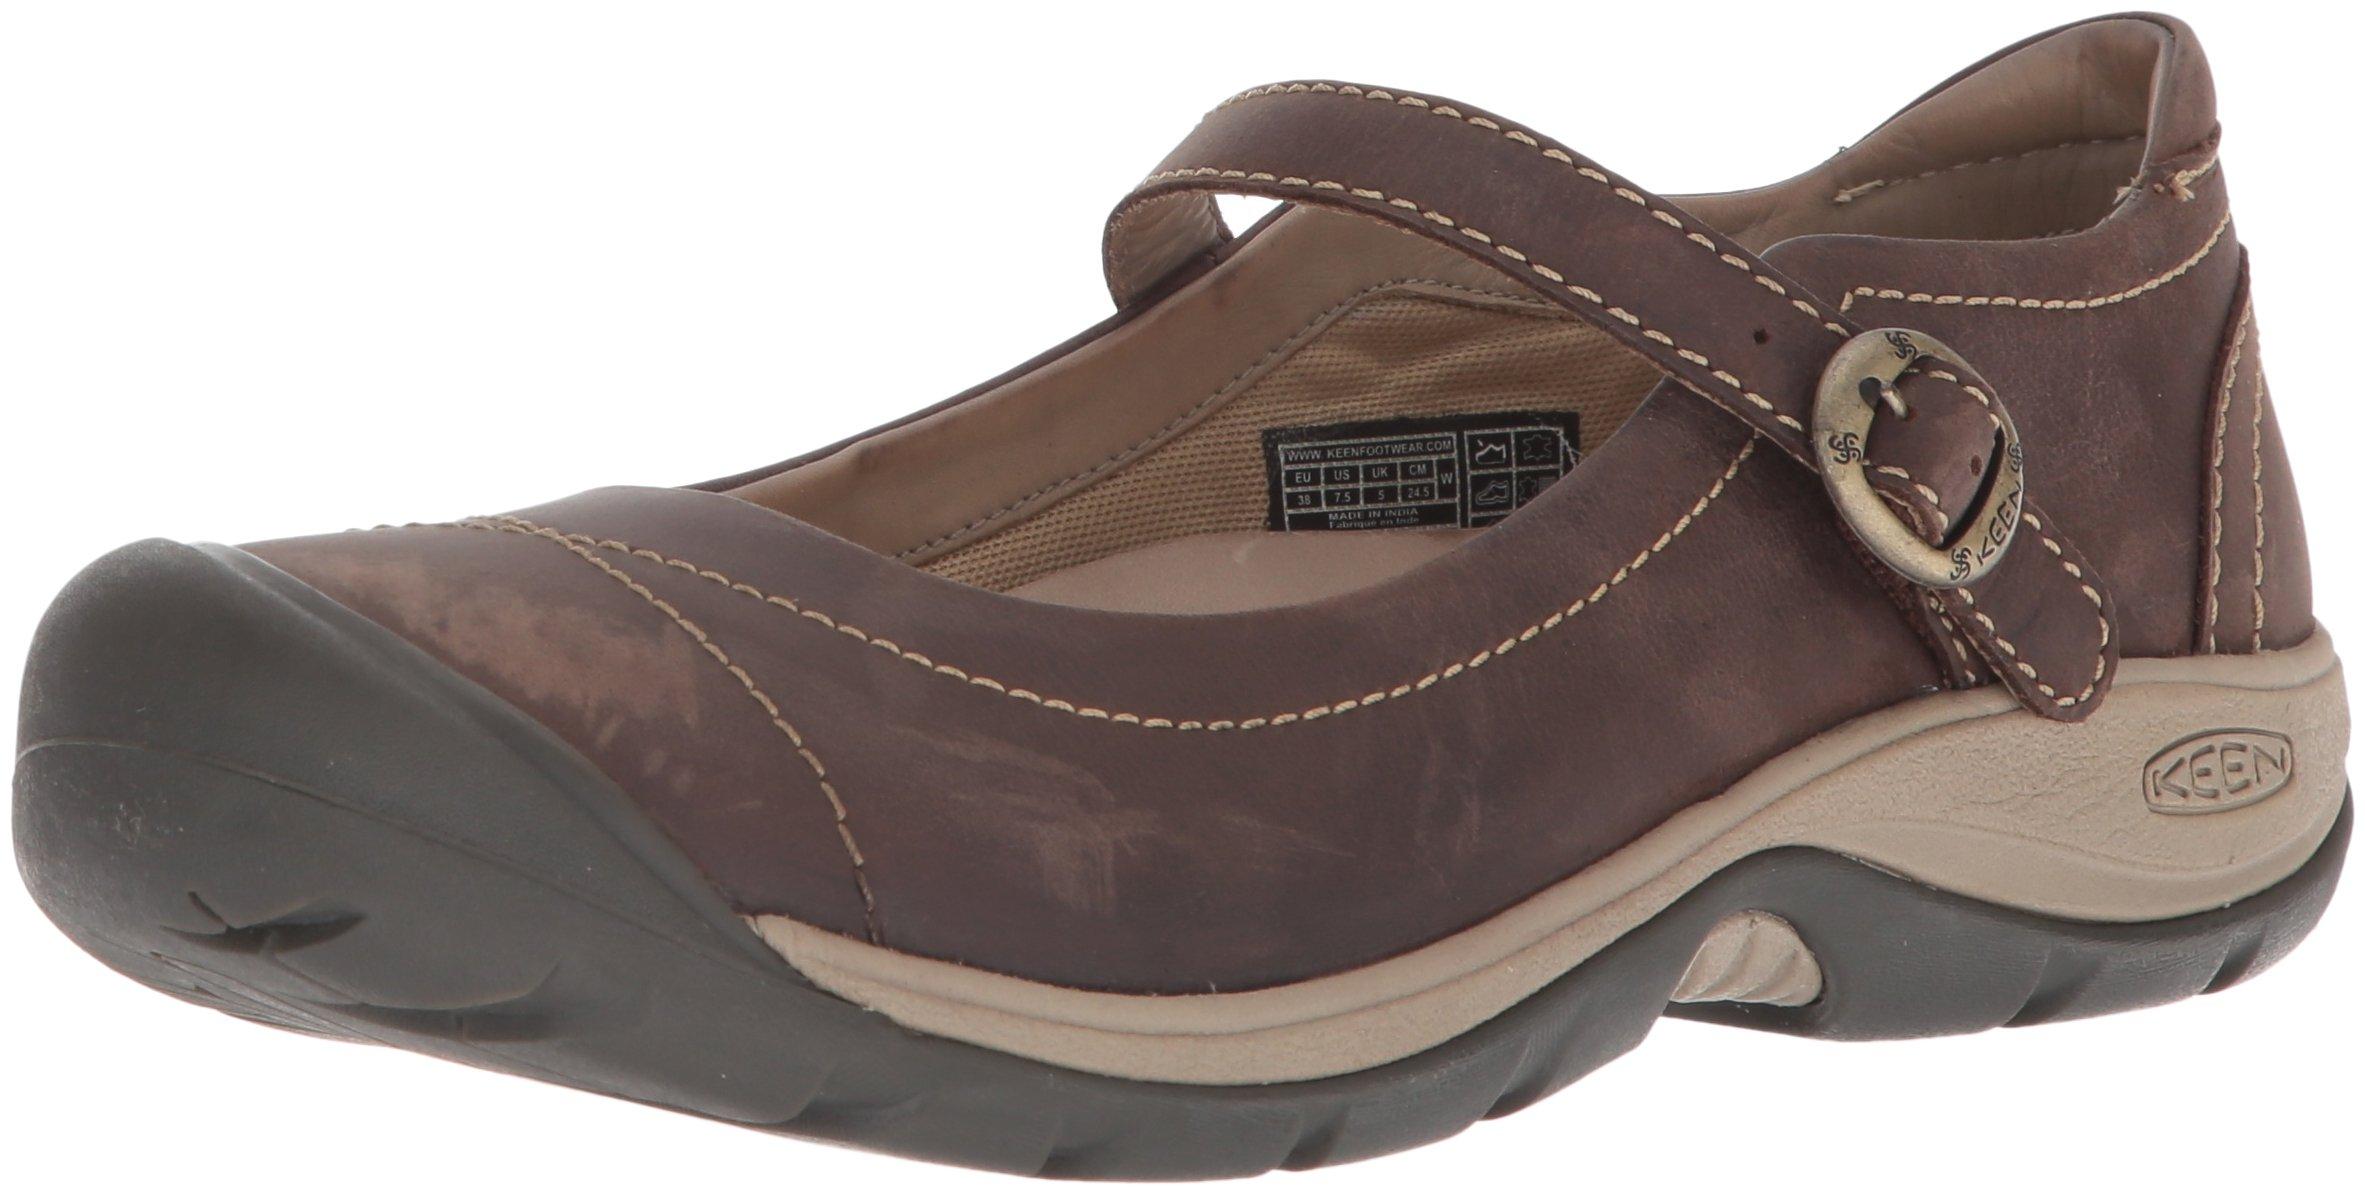 KEEN Women's Presidio II MJ-W Hiking Shoe, Infield/Cornstalk, 8.5 M US 1